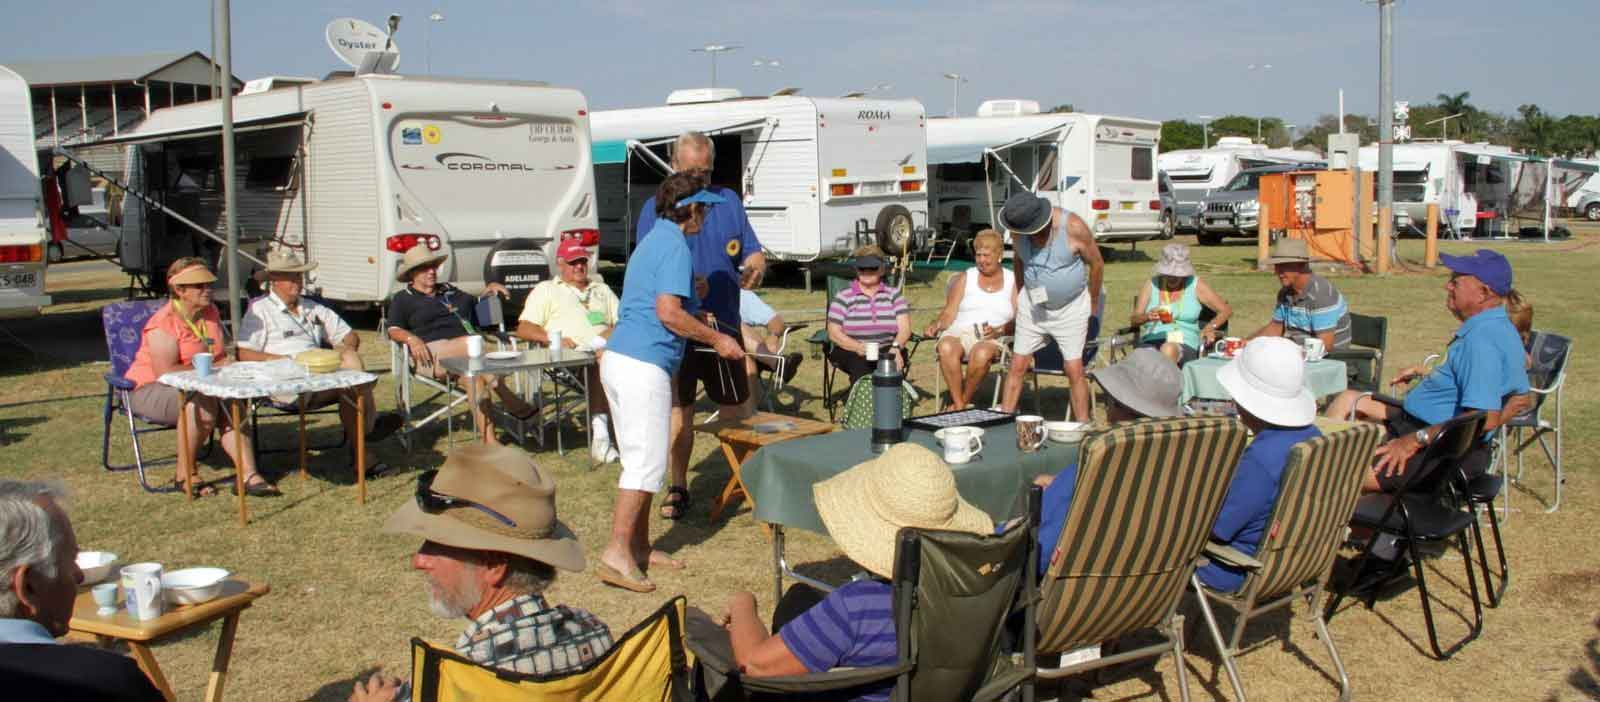 Caravan Club gathering